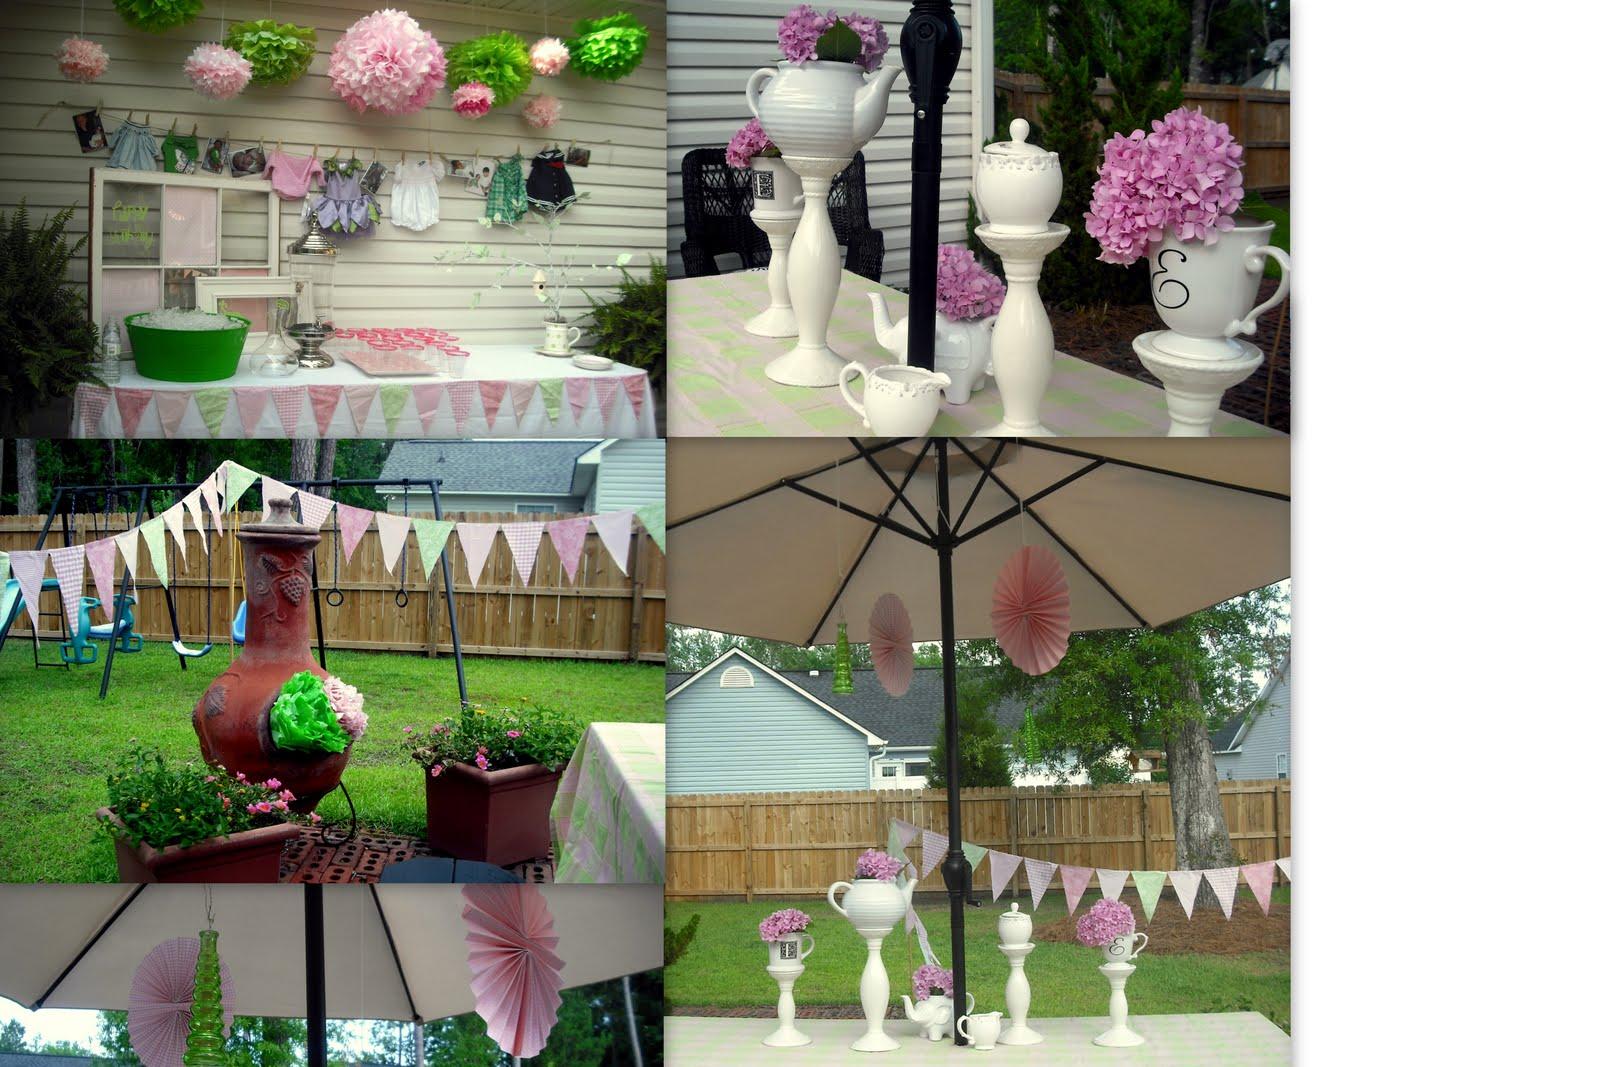 http://4.bp.blogspot.com/_L-deInbQA9c/TOvoGAvjMkI/AAAAAAAAItk/jaRSWK4y8EA/s1600/First-Birthday-shabby-chic-tea-party.jpg